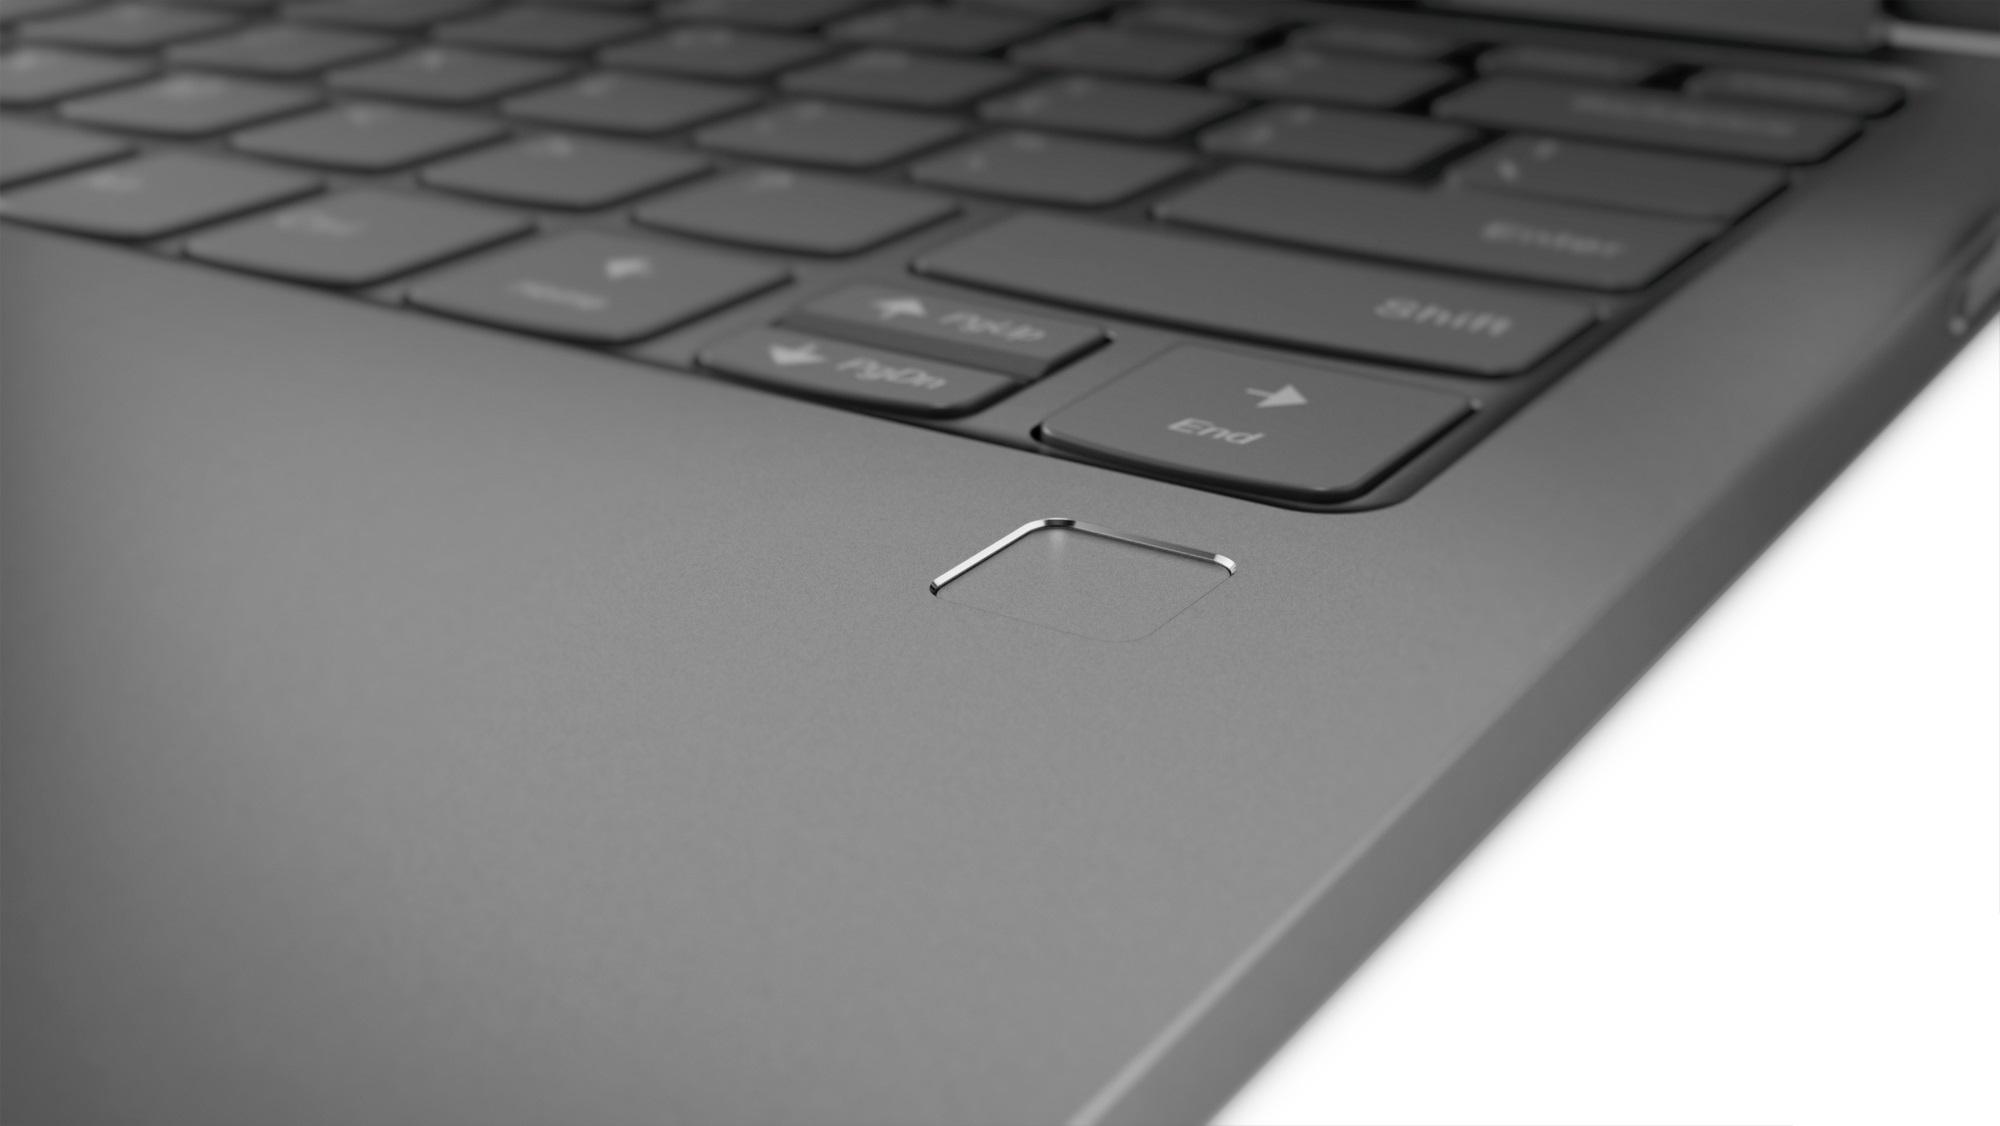 Фото  Ультрабук Lenovo Yoga 730 Iron Grey (81CT008SRA)